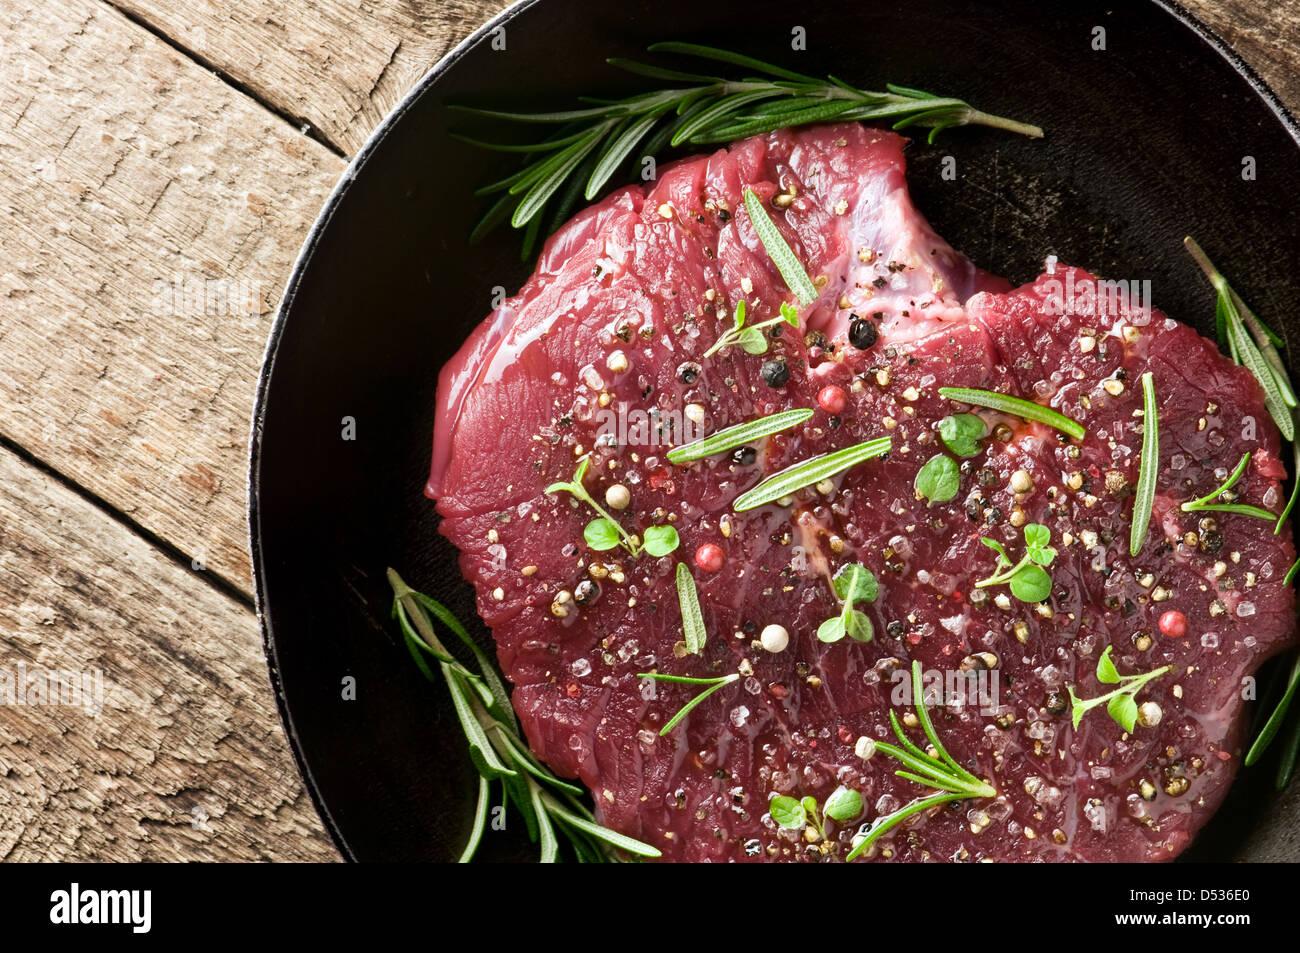 beef piece in frying pan - Stock Image